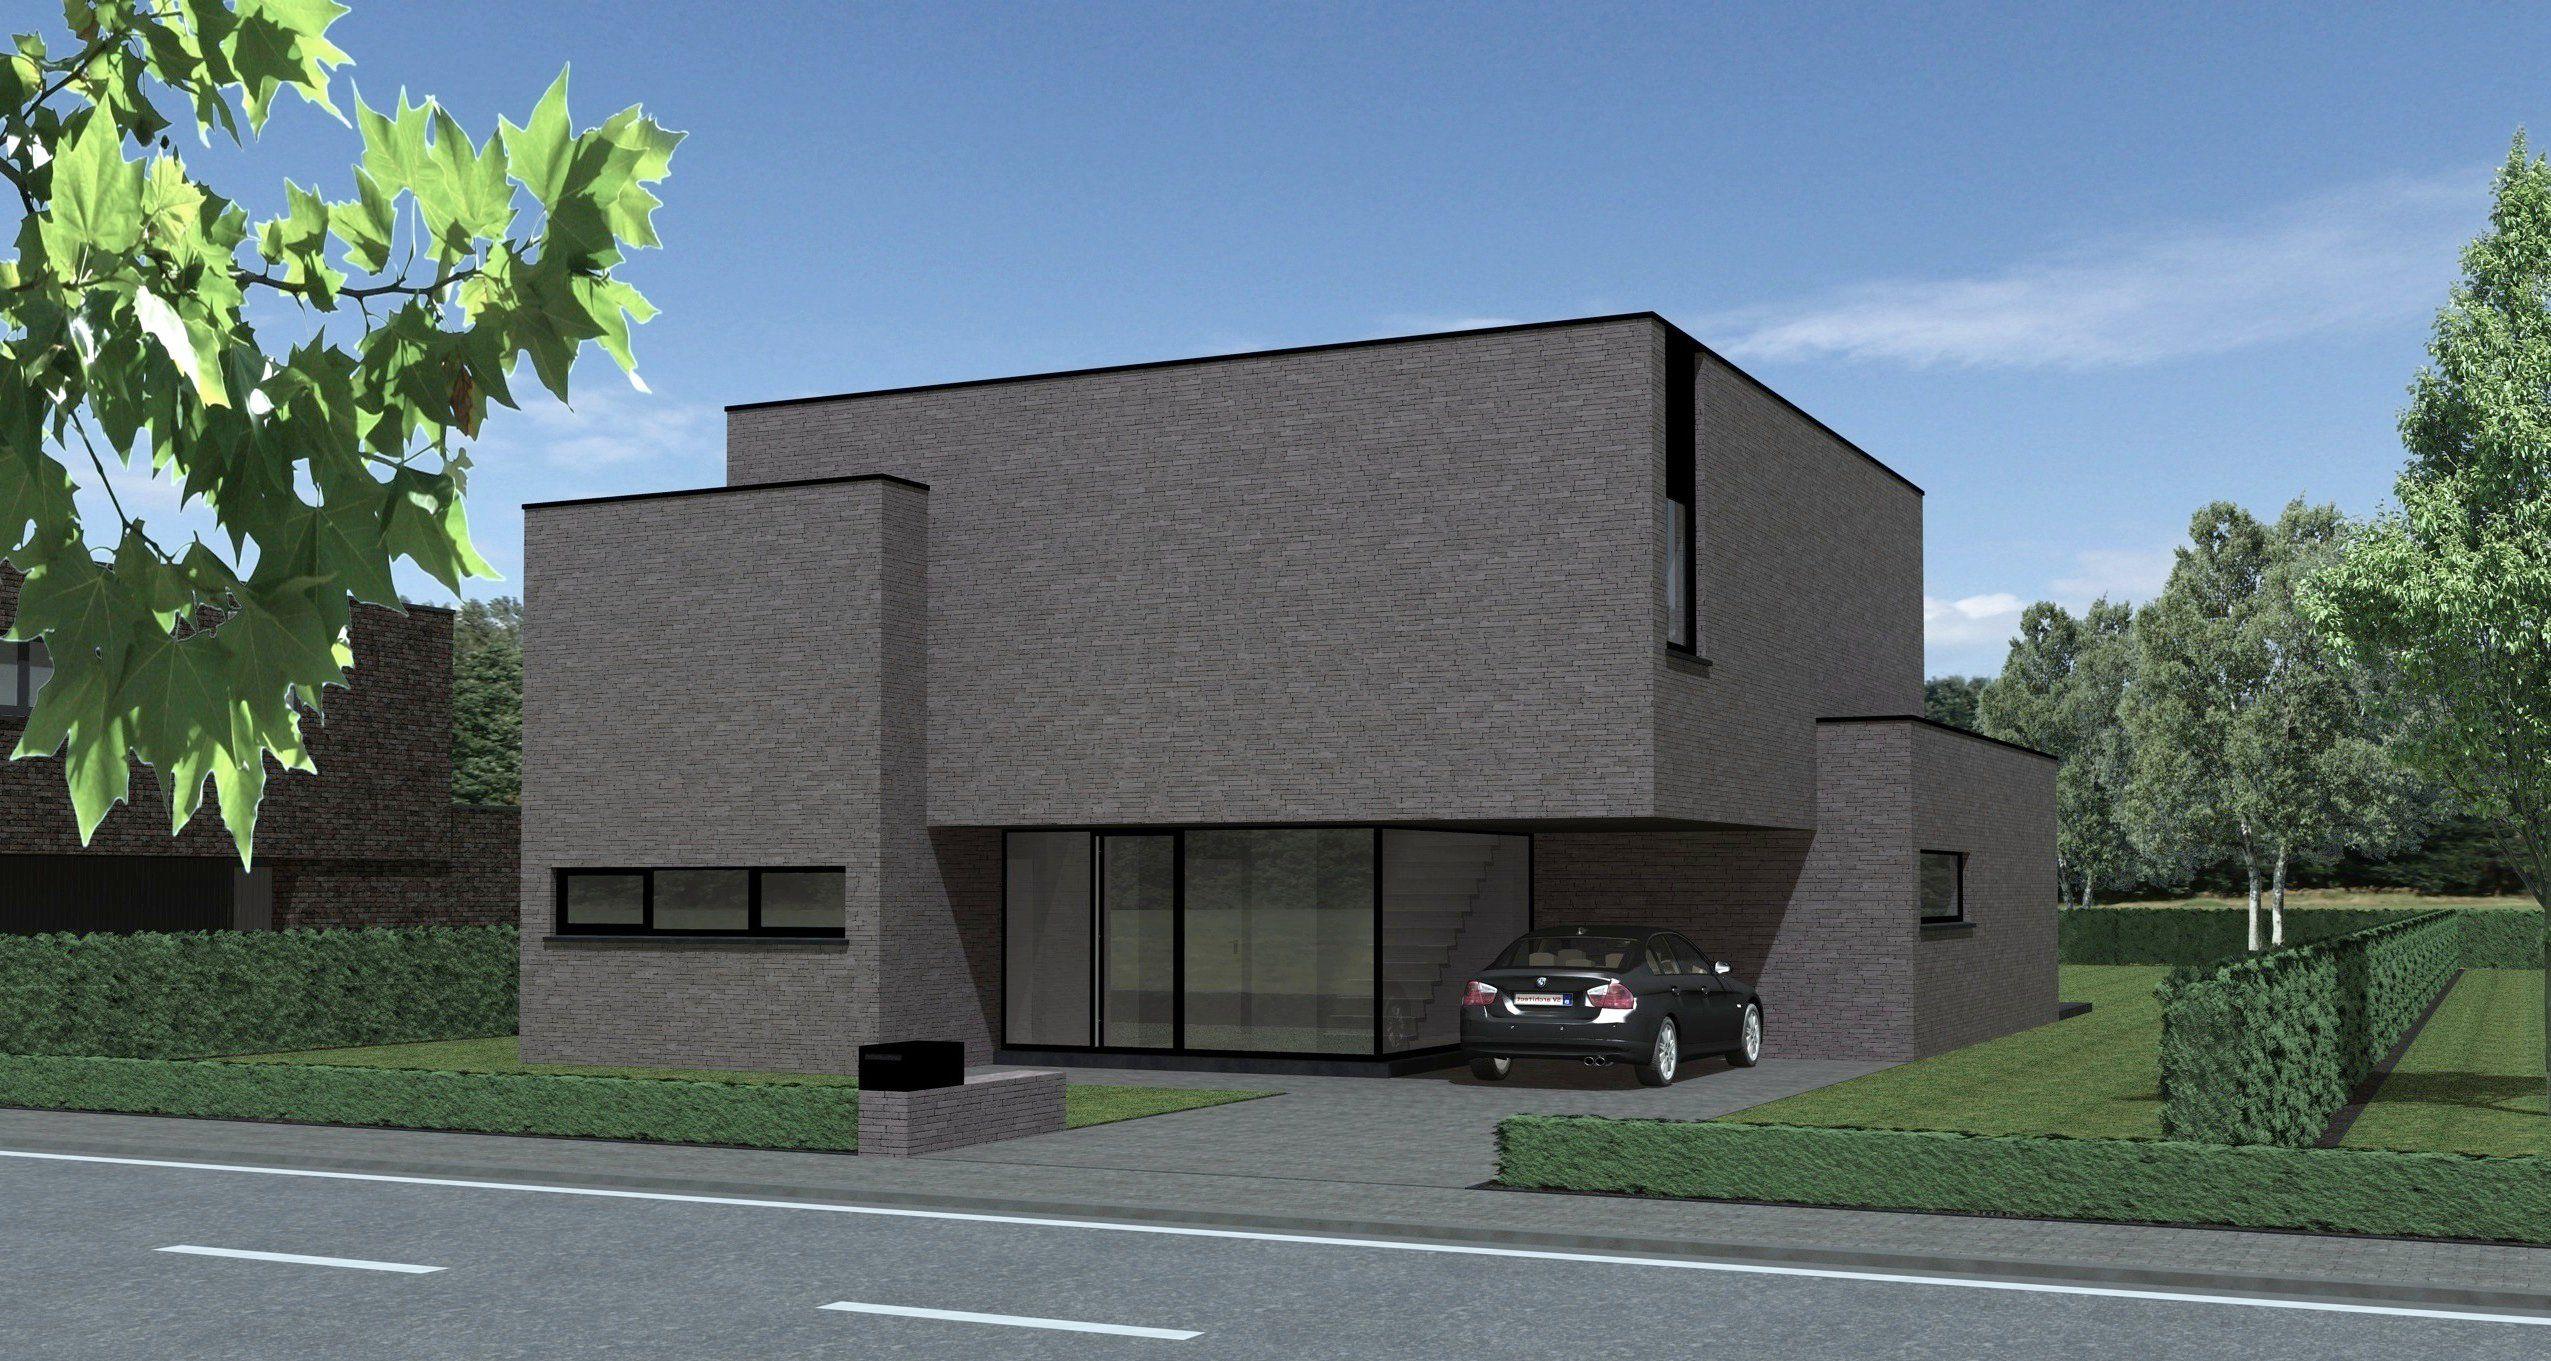 SV architect te genk (Limburg) tijdloze moderne woningen